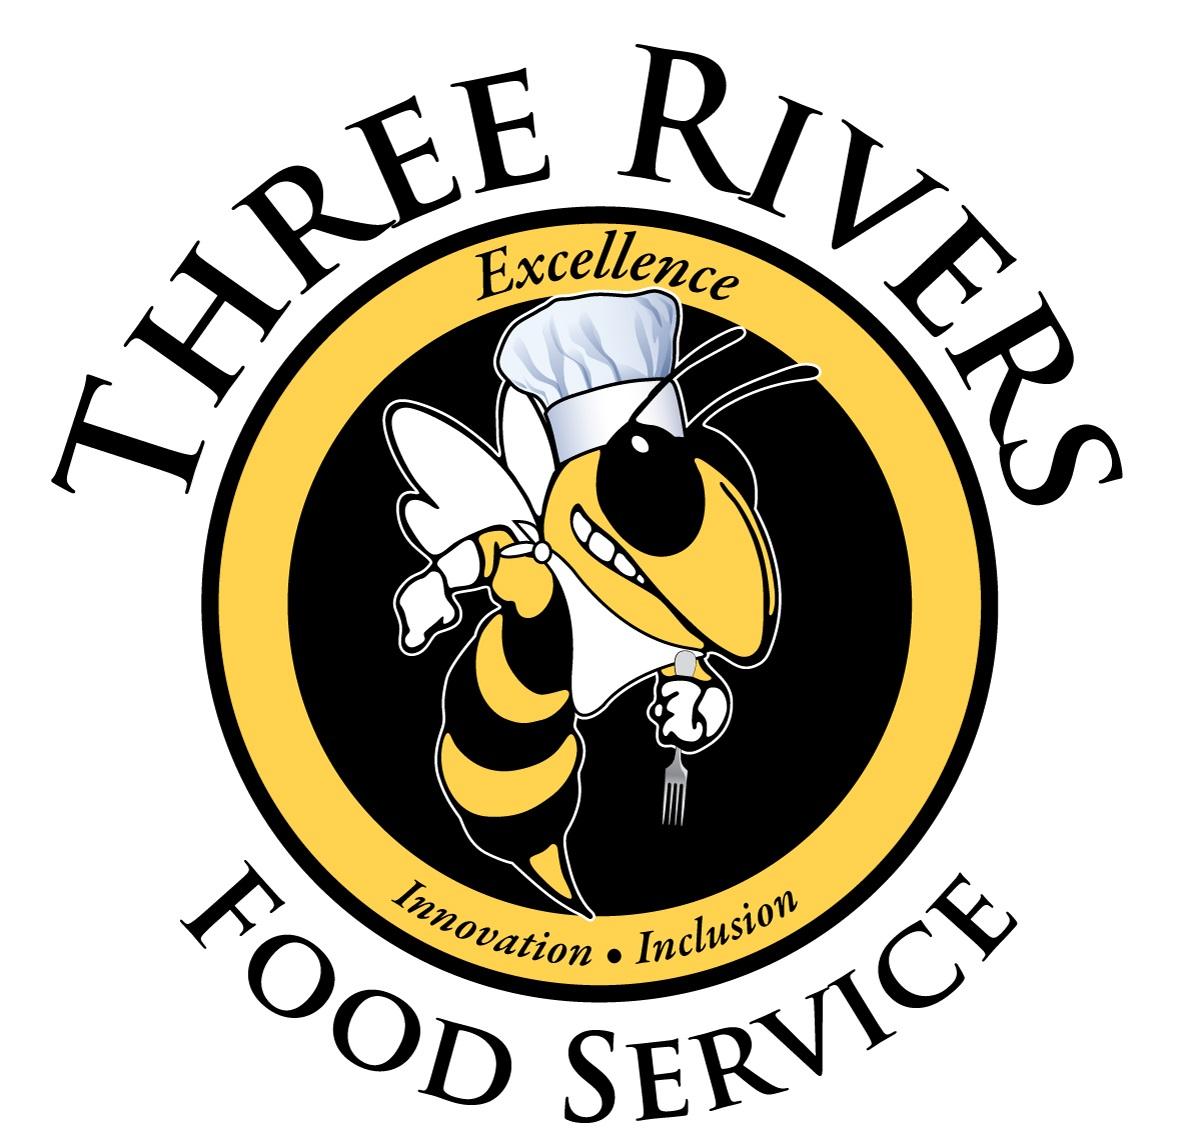 Three Rivers Food Service logo